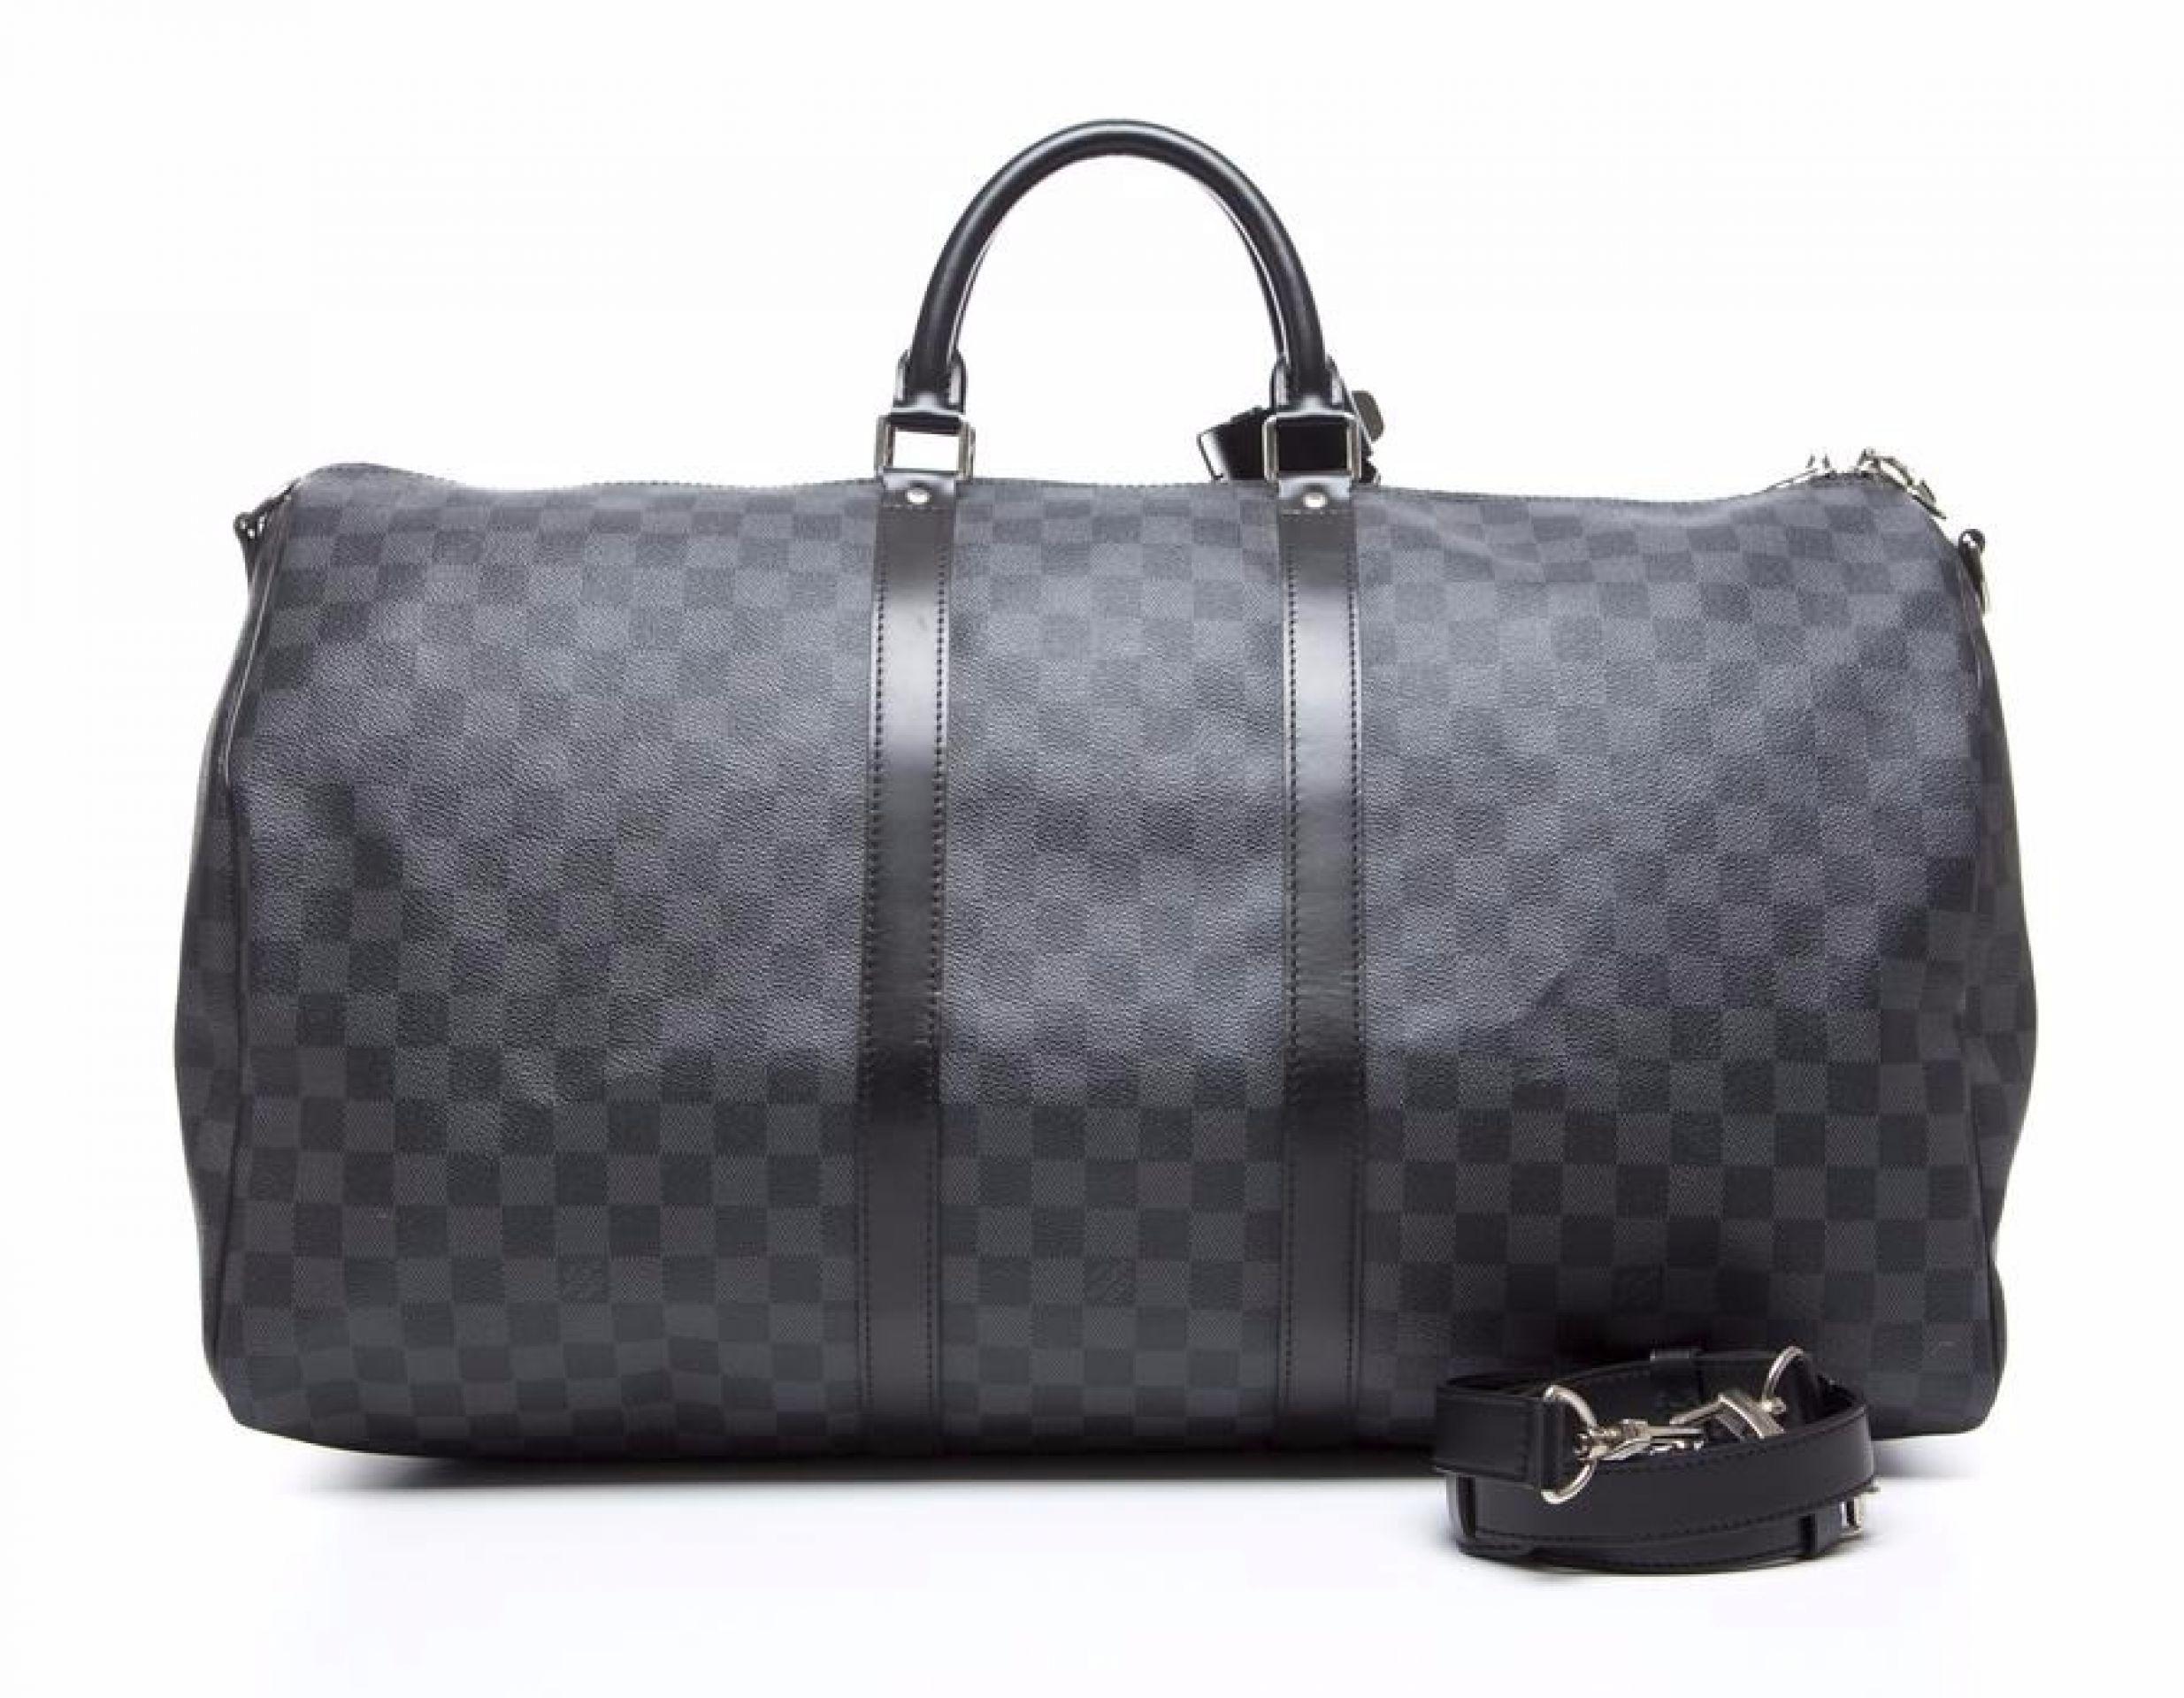 Louis Vuitton Damier Graphite Keepall Bandouliere 55 Bag